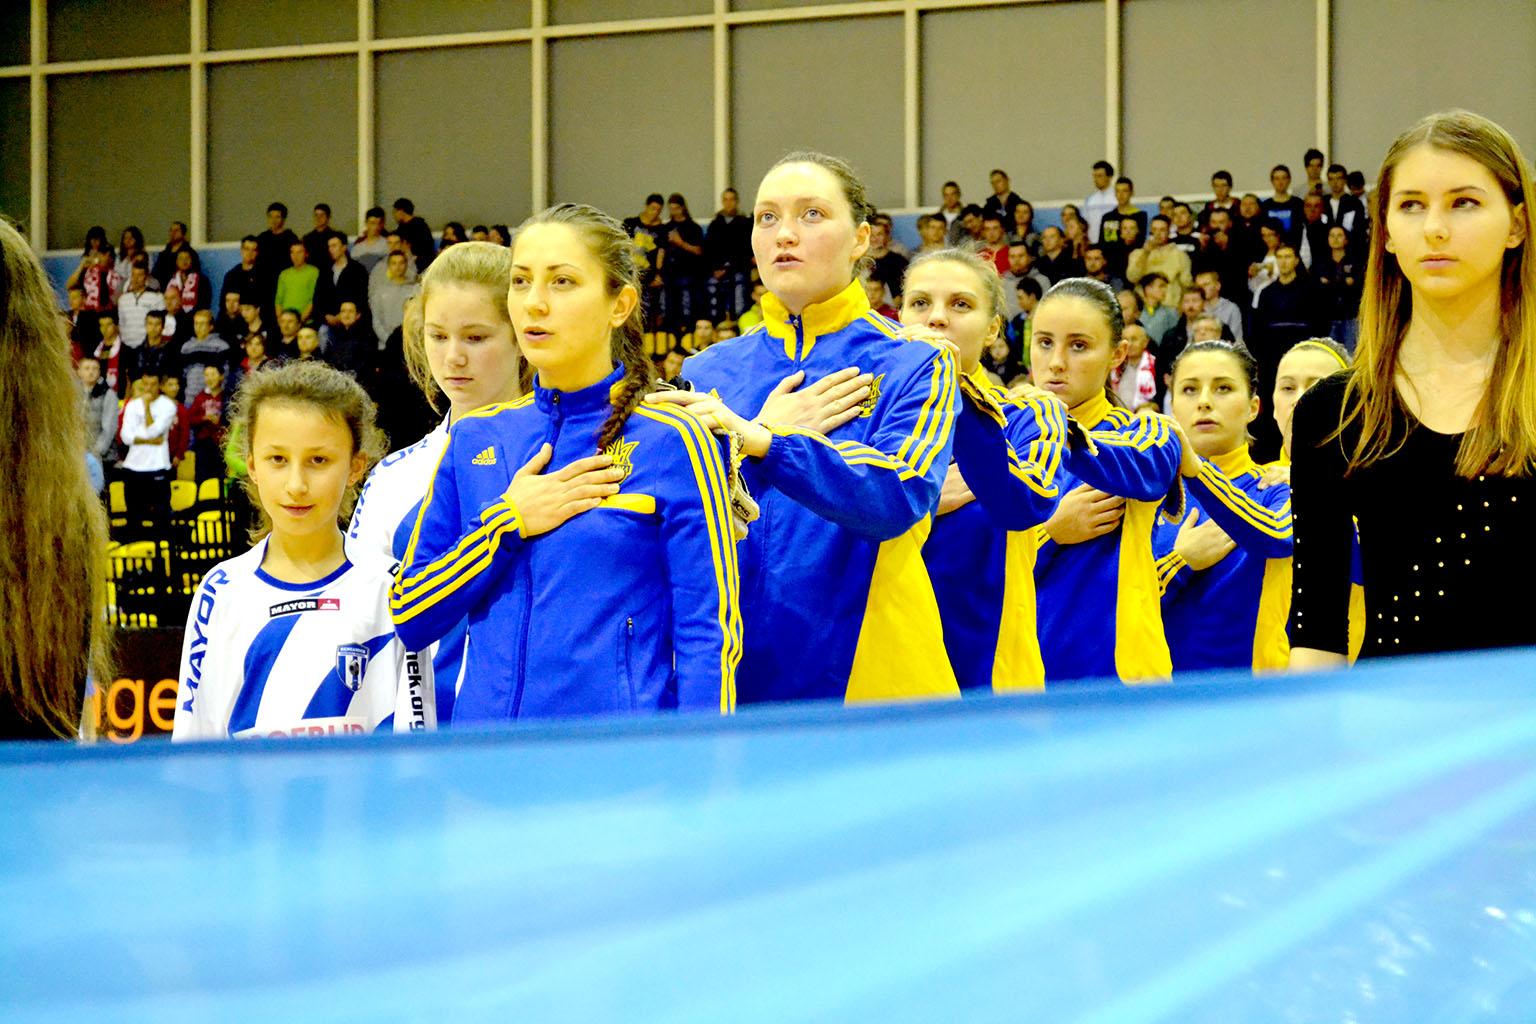 женская сборная футзал, ФФУ, women's team Ukraine, АФУ, жіноча збірна футзал, Reprezentacja kobiet, польша, futsal